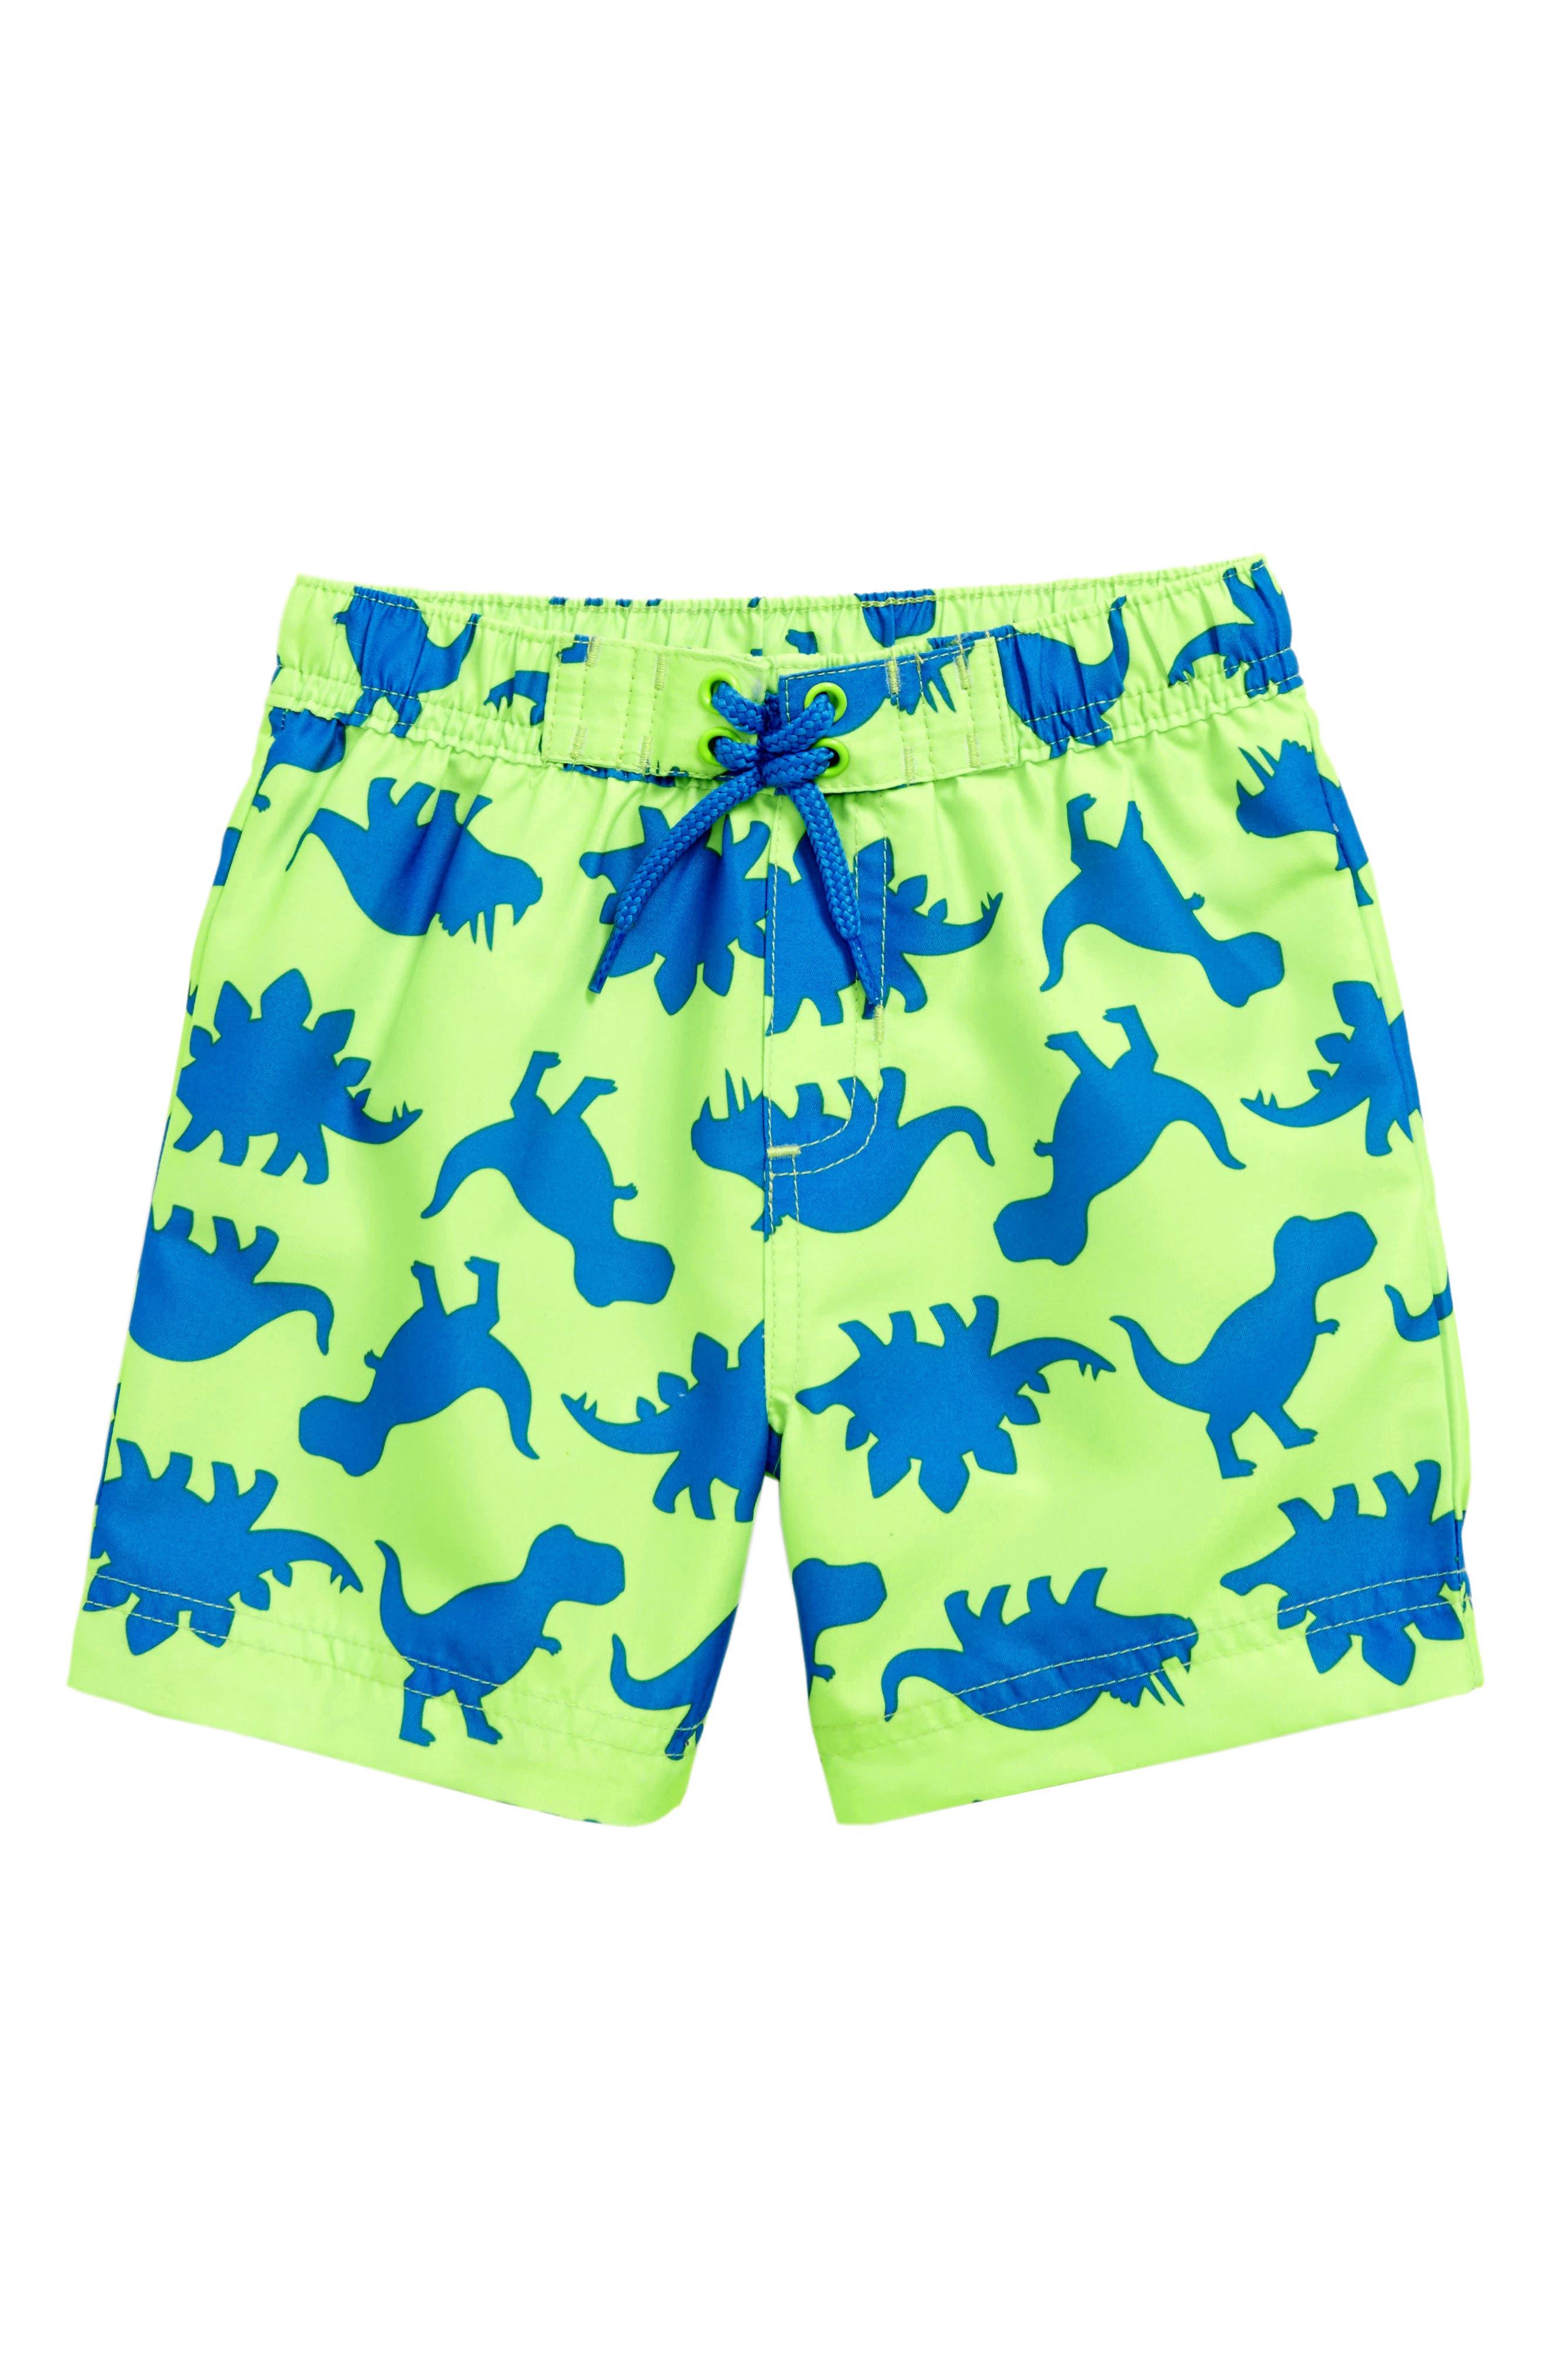 Dino UPF 50+ Swim Trunks,                         Main,                         color, Green Multi